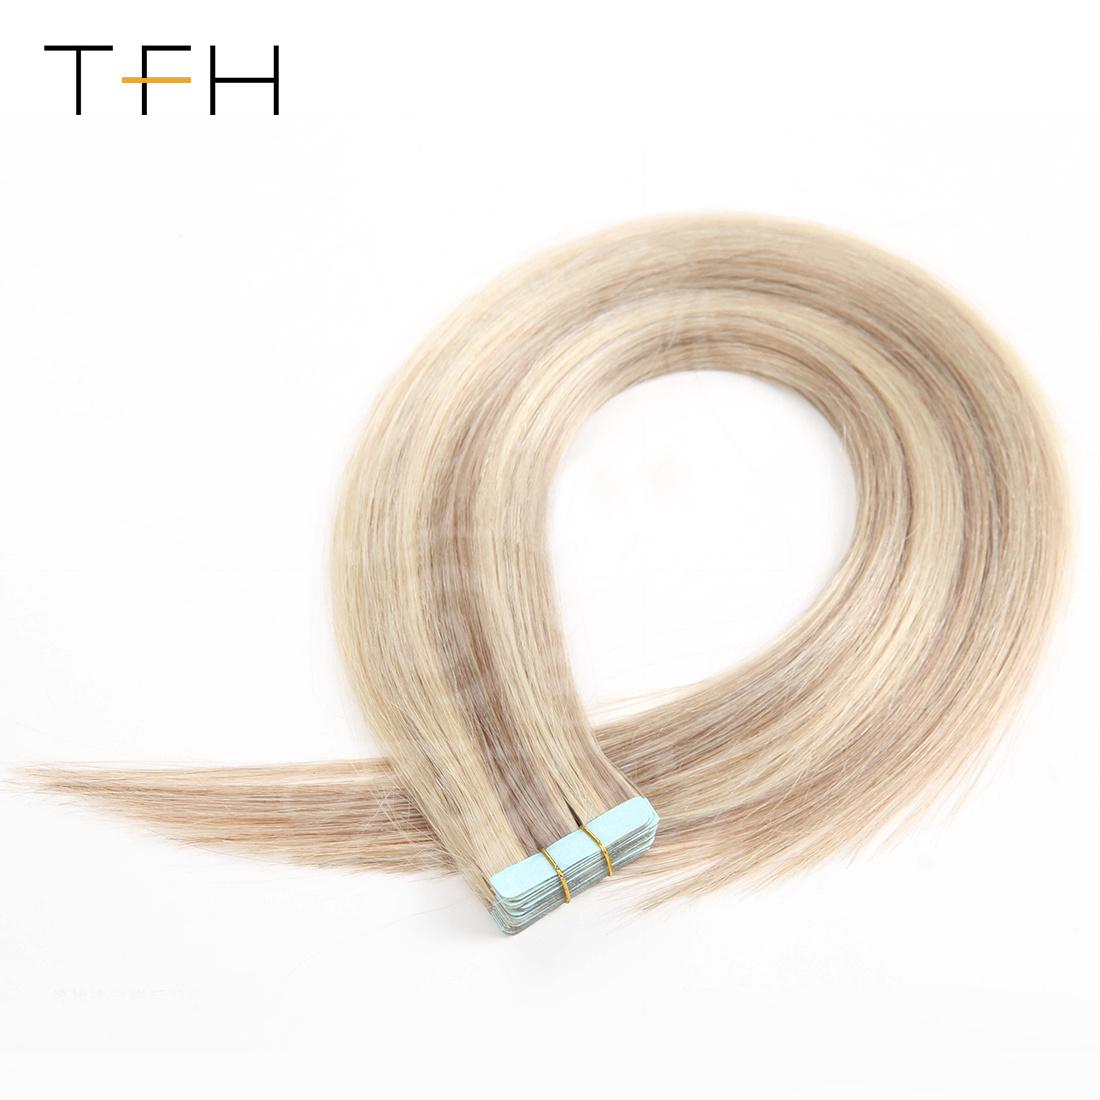 China Top Fashion Hair 14 16 18 20 22 24 26 Machine Made Remy